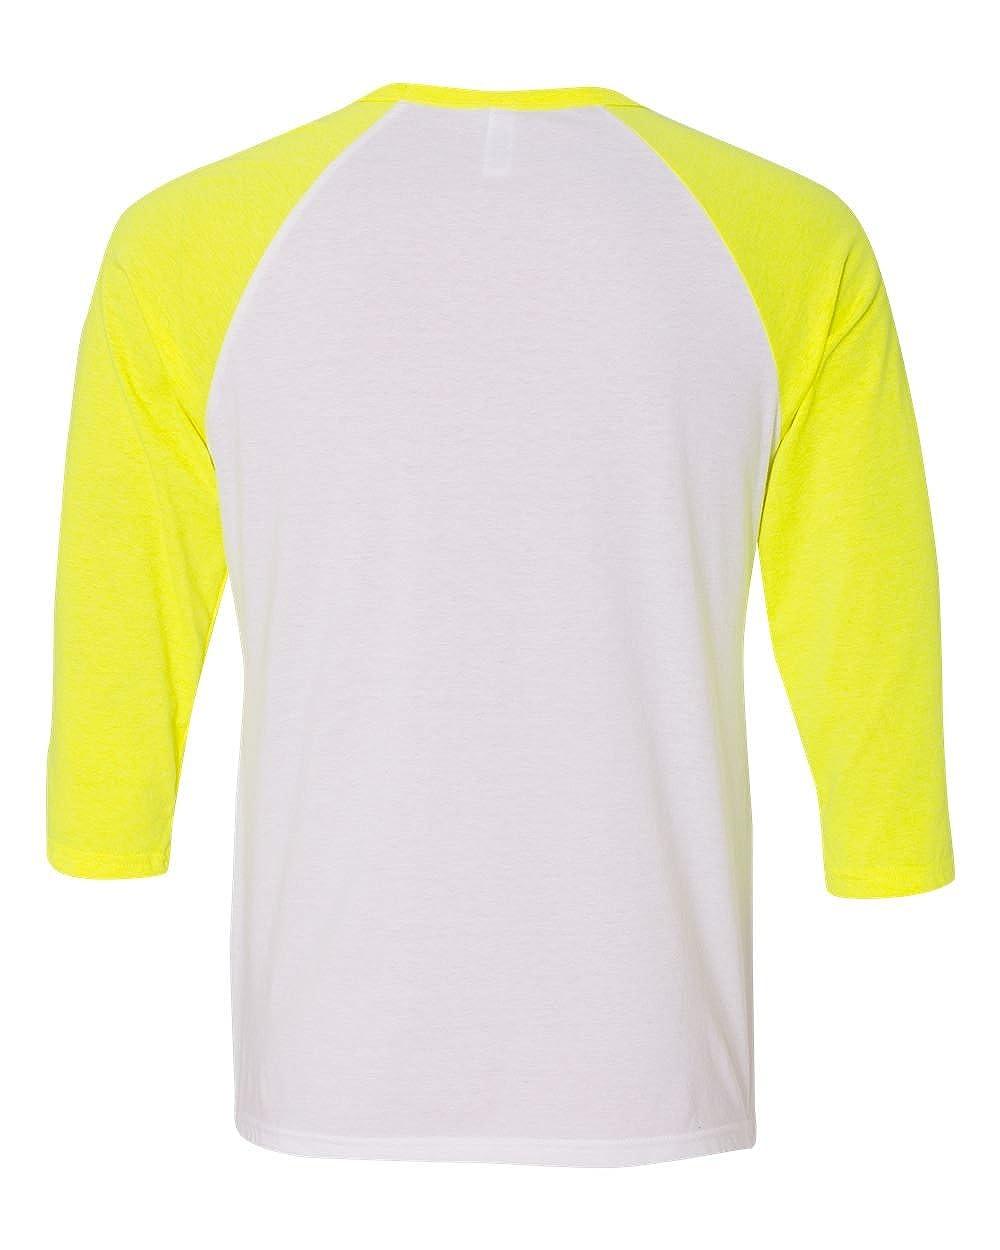 XL - Bella WHT//NEON Yellow Canvas Unisex 3//4-Sleeve Baseball T-Shirt Style # 3200 - Original Label